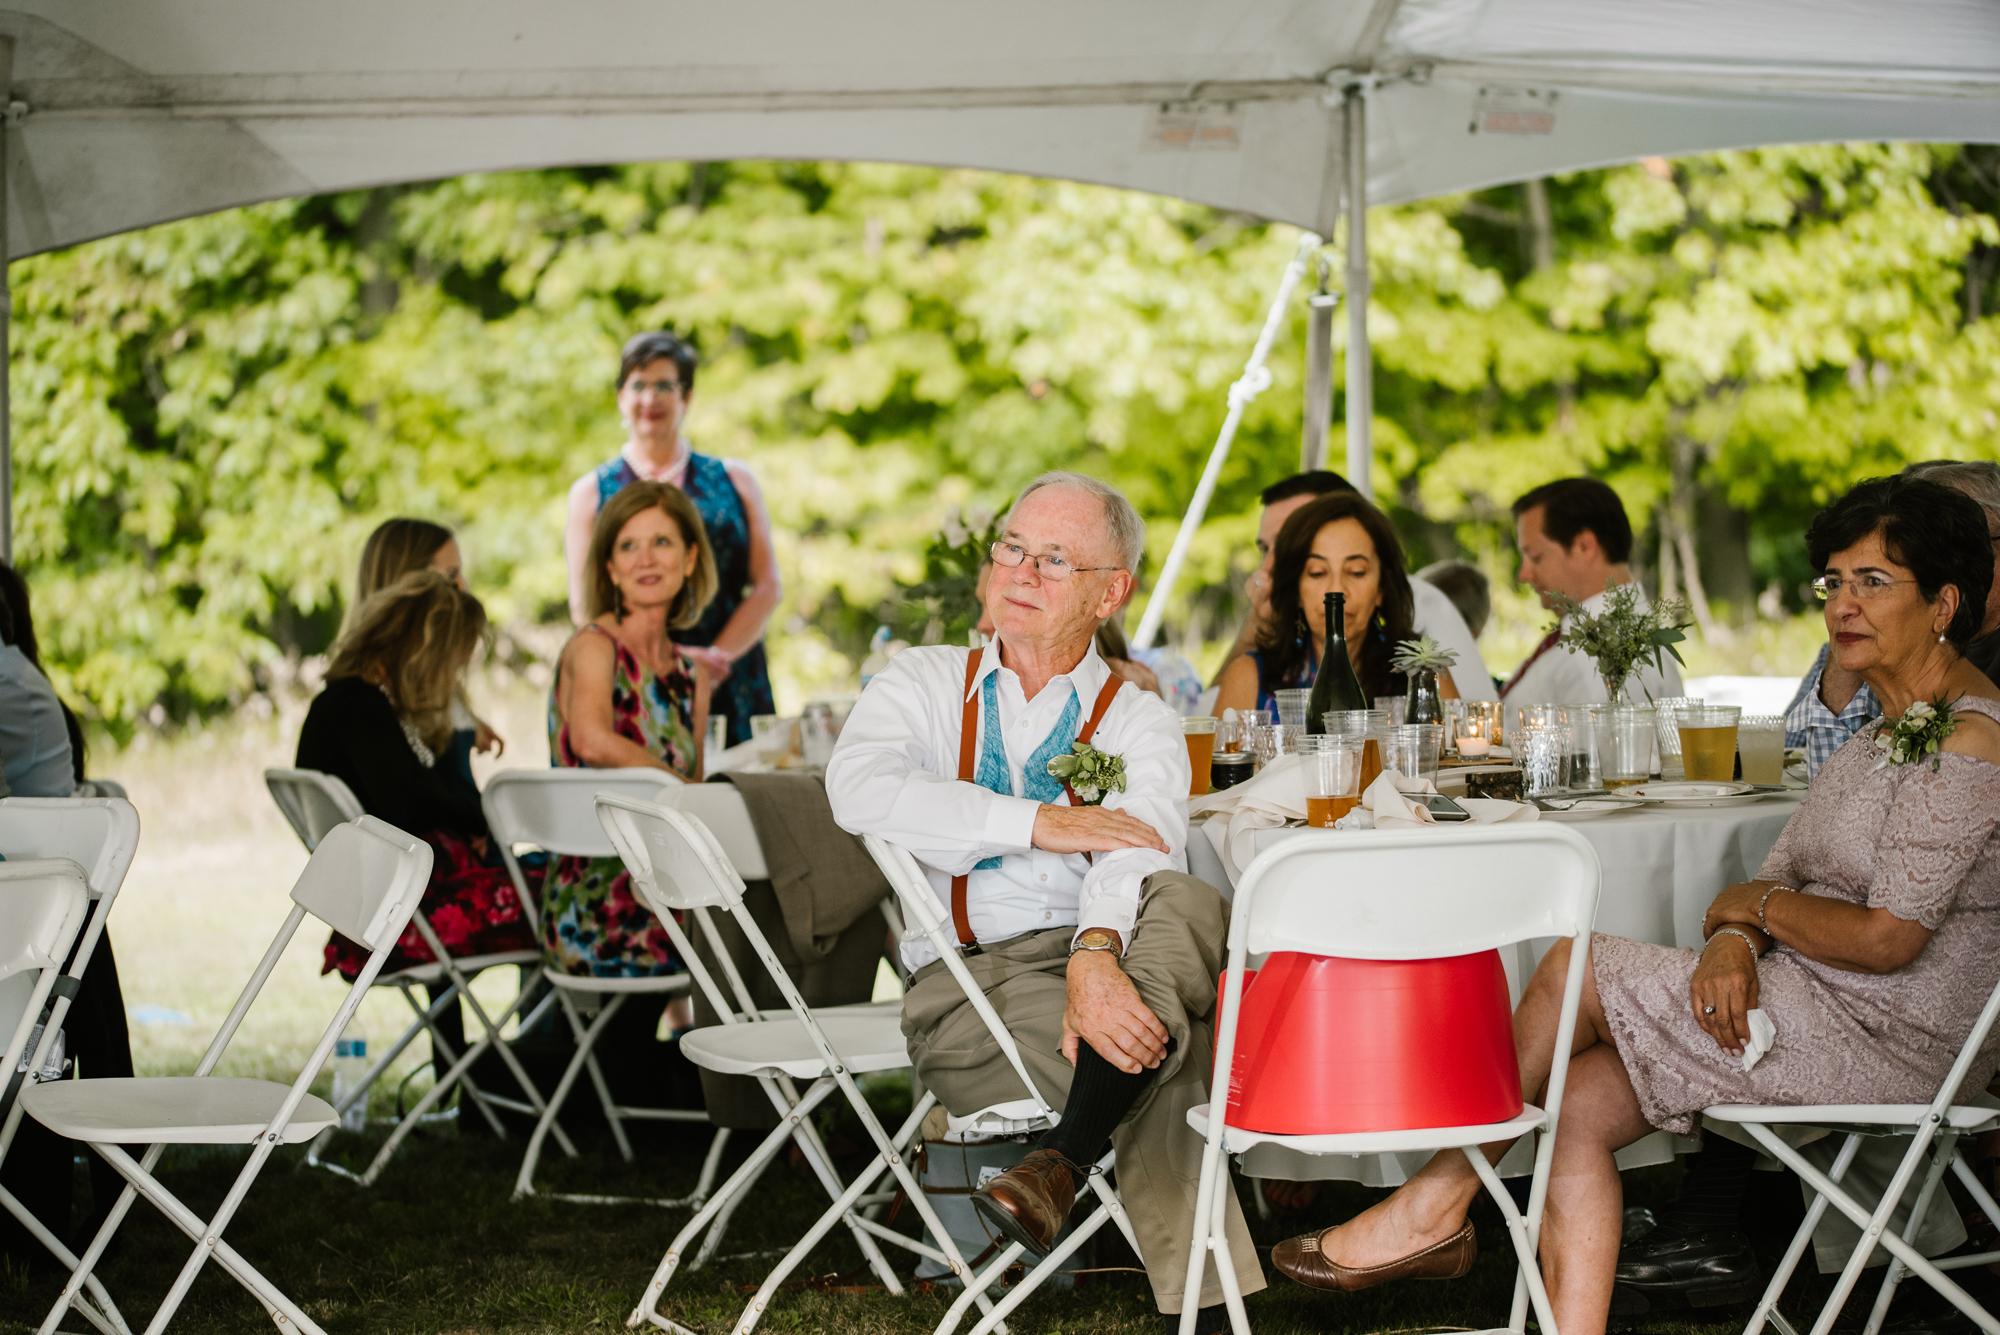 Quincy-Coldwater-Michigan-farm-wedding-photogapher-sydney-marie (436).jpg